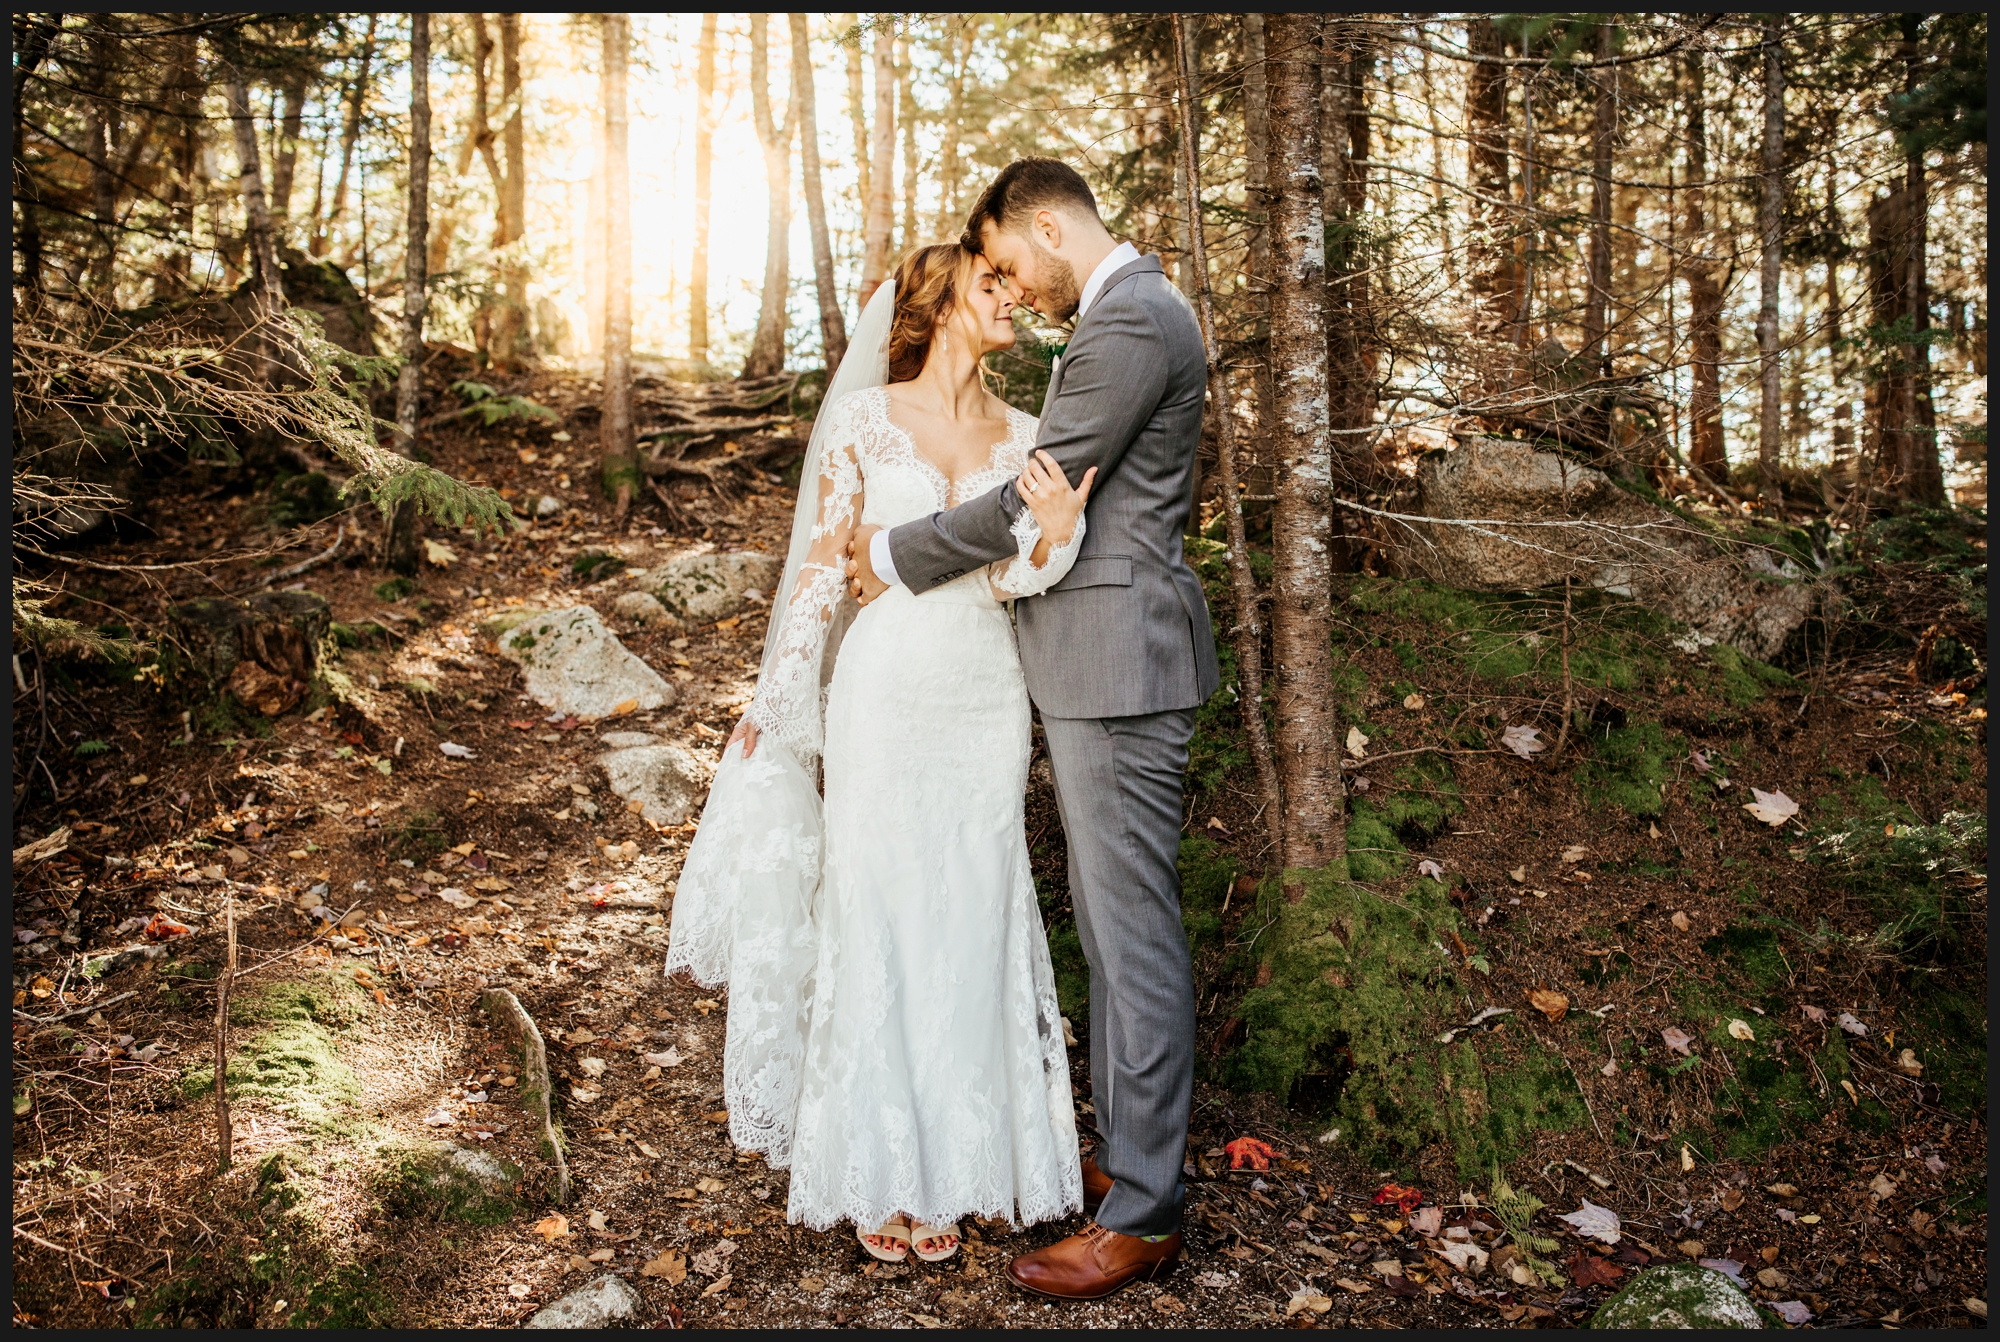 Orlando-Wedding-Photographer-destination-wedding-photographer-florida-wedding-photographer-hawaii-wedding-photographer_0157.jpg